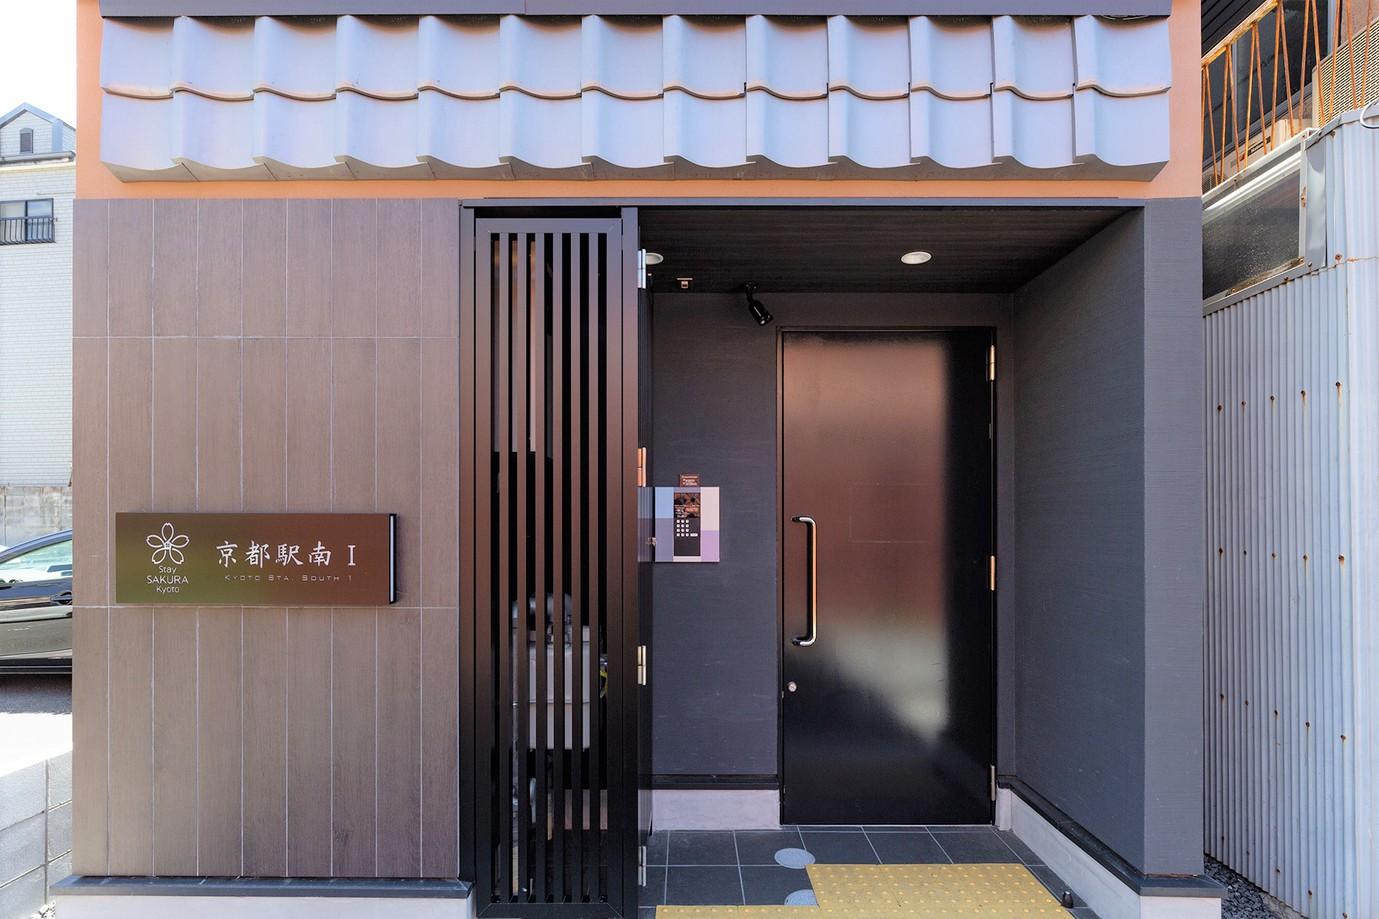 Stay SAKURA 京都駅南Iの施設画像